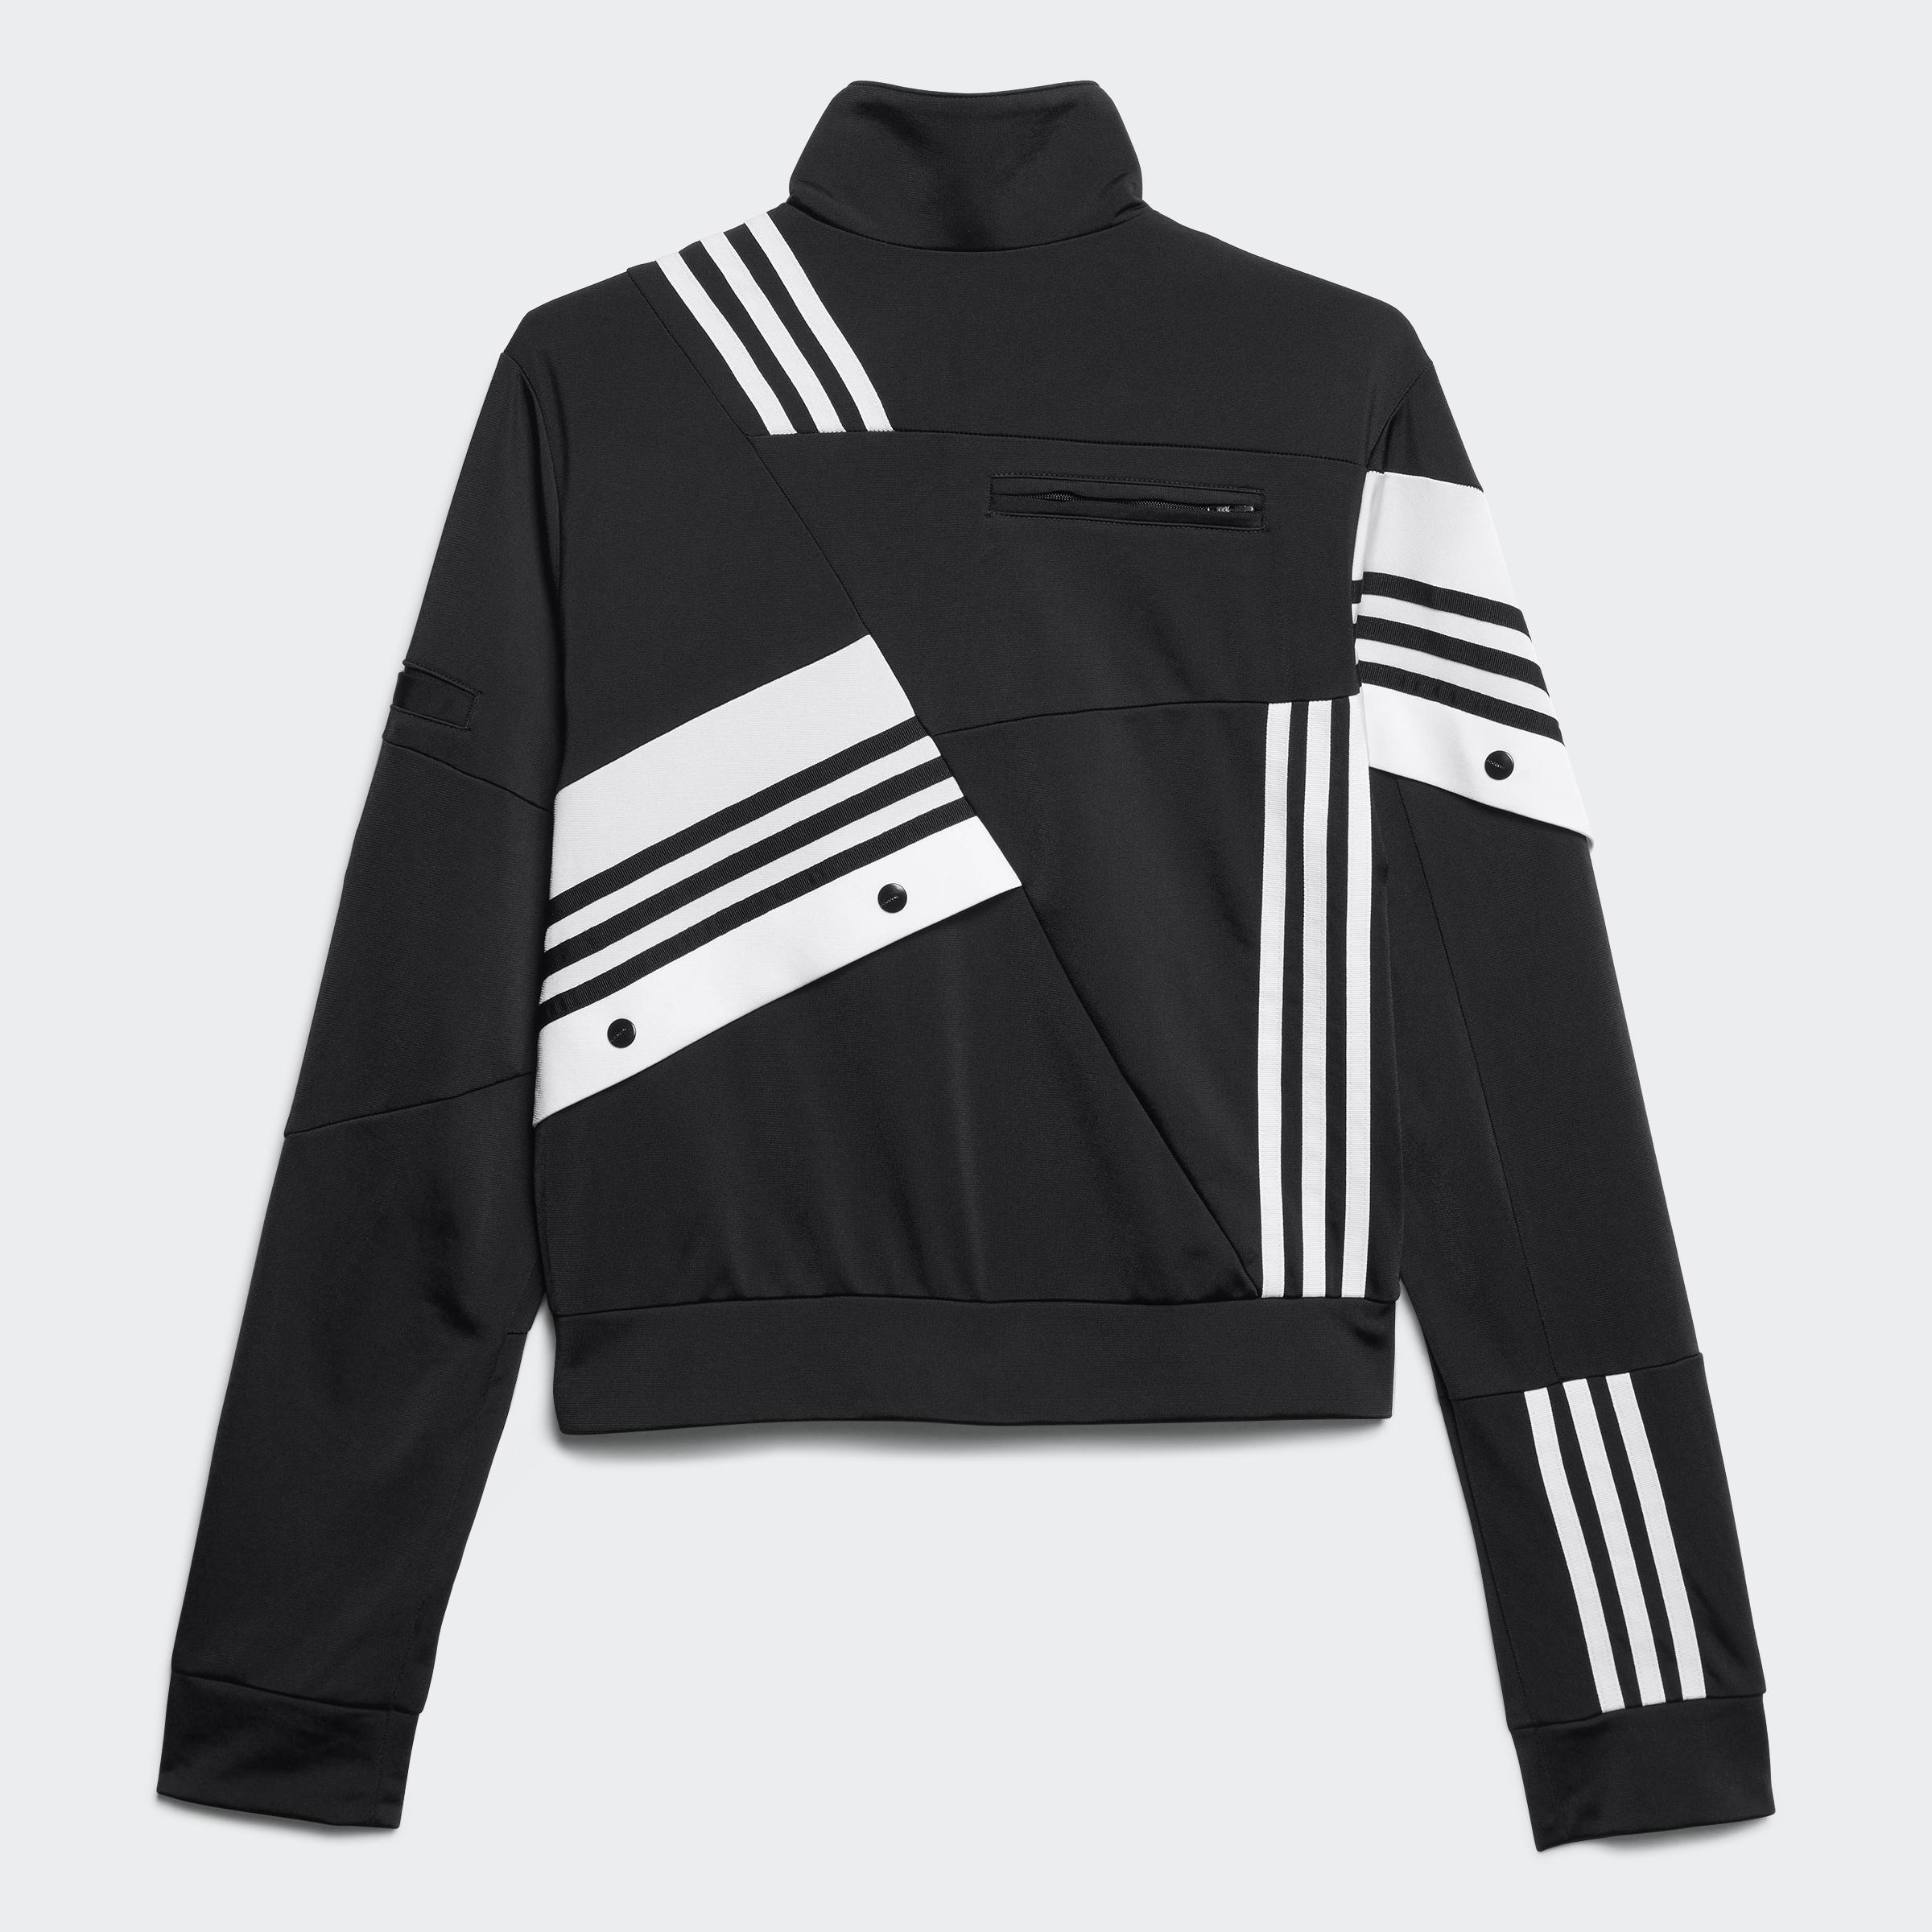 promo code 37da2 6b954 Adidas - Deconstructed Track Jacket - 2